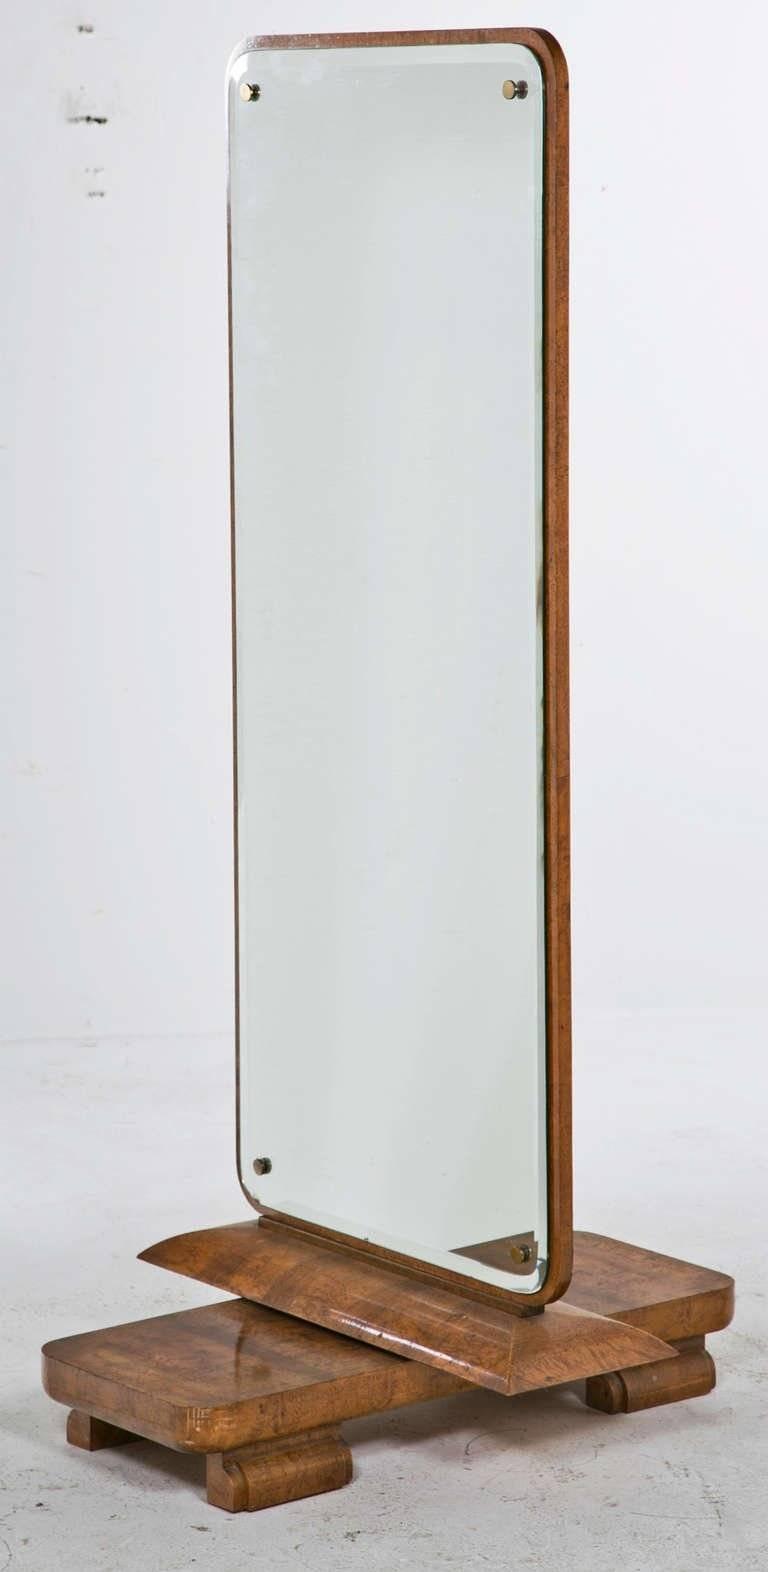 Full Length Art Deco Dressing Mirror European Circa 1930 At 1Stdibs with Art Deco Full Length Mirrors (Image 10 of 15)